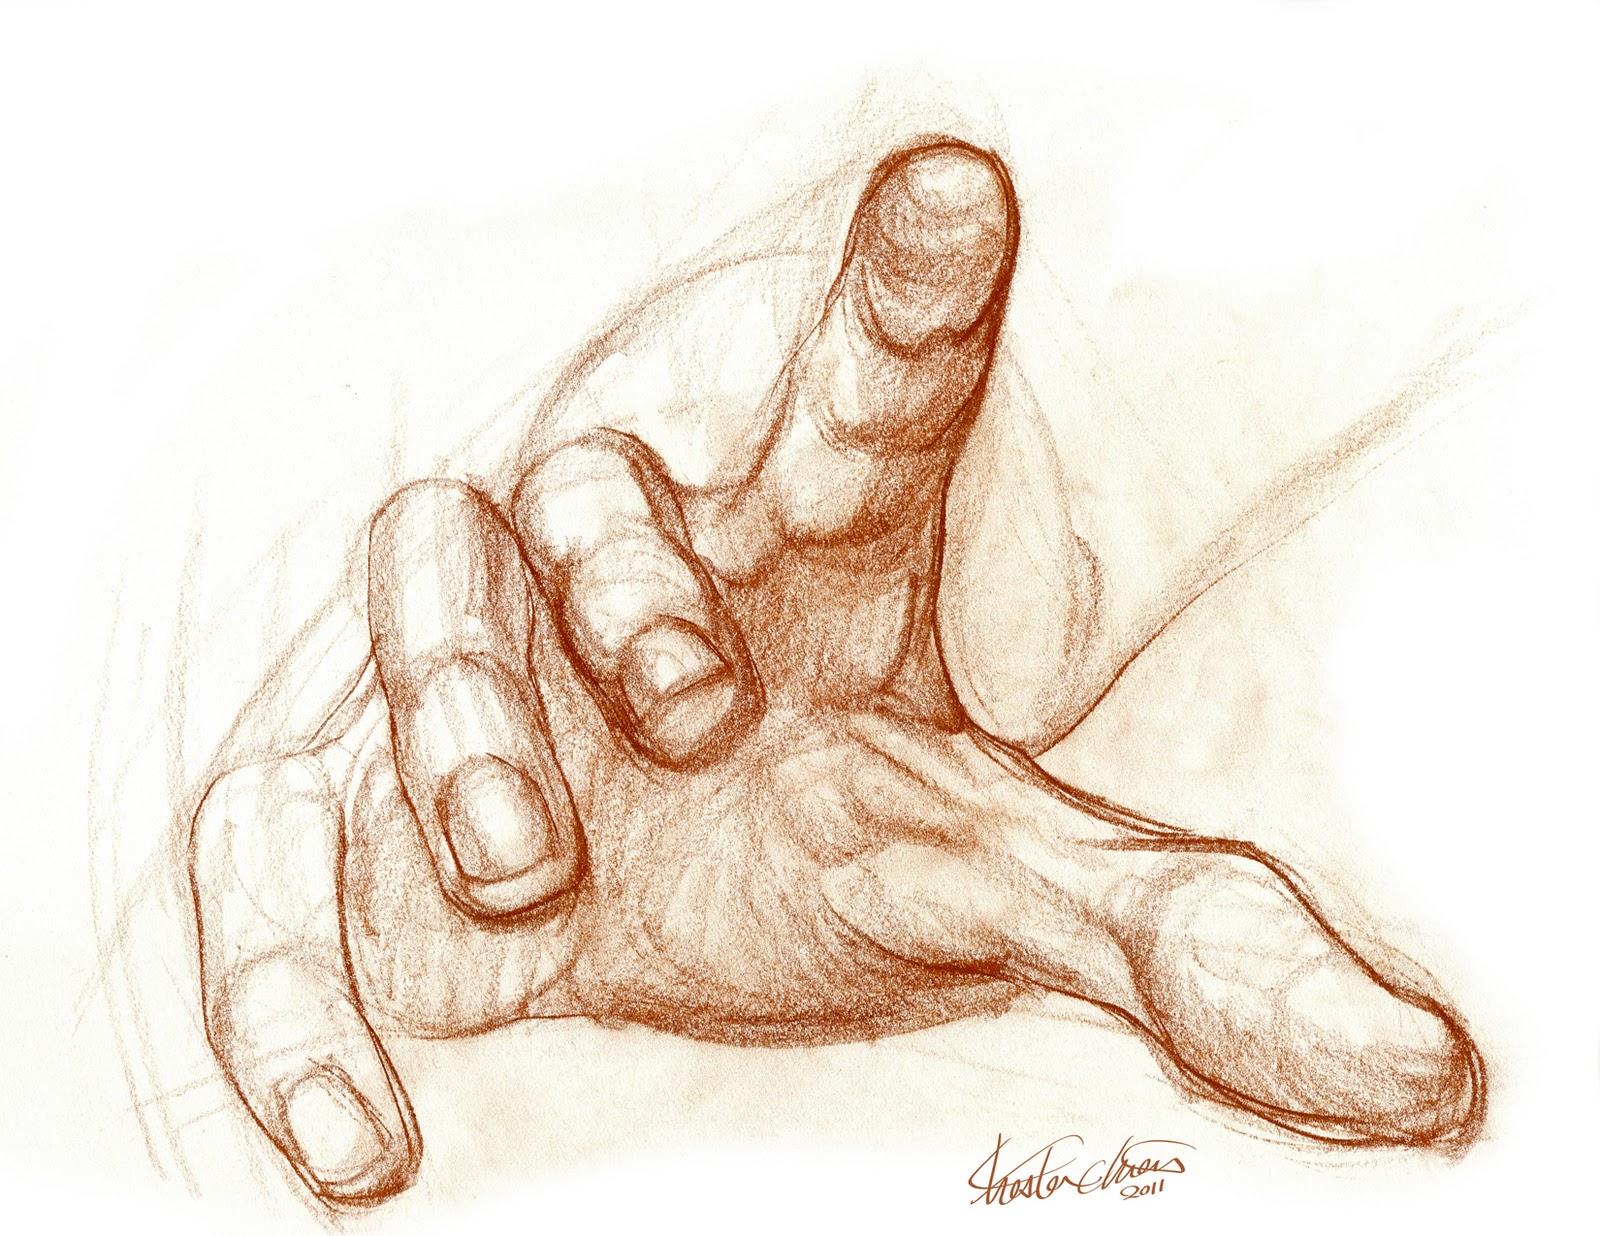 Палец к руке кто нарисовал